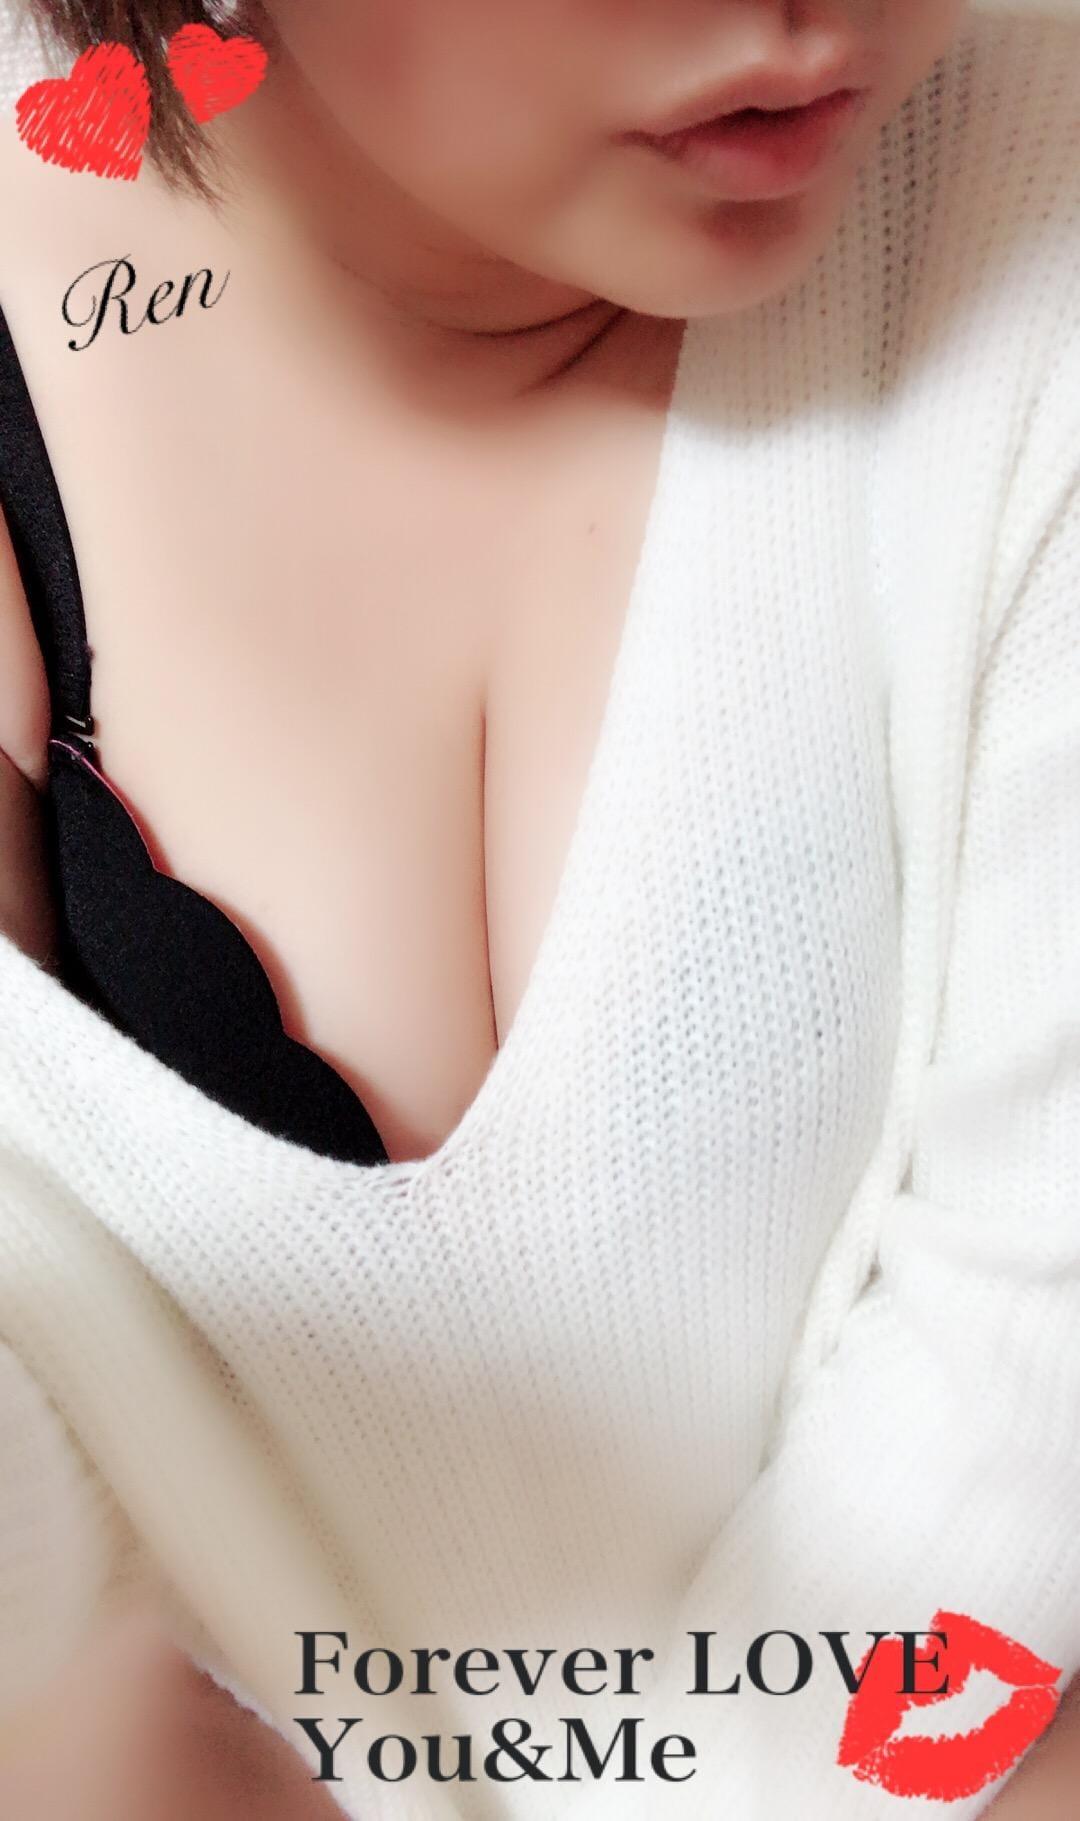 Ren(れん)「エッチな土曜日に…❤️」12/15(土) 09:26 | Ren(れん)の写メ・風俗動画